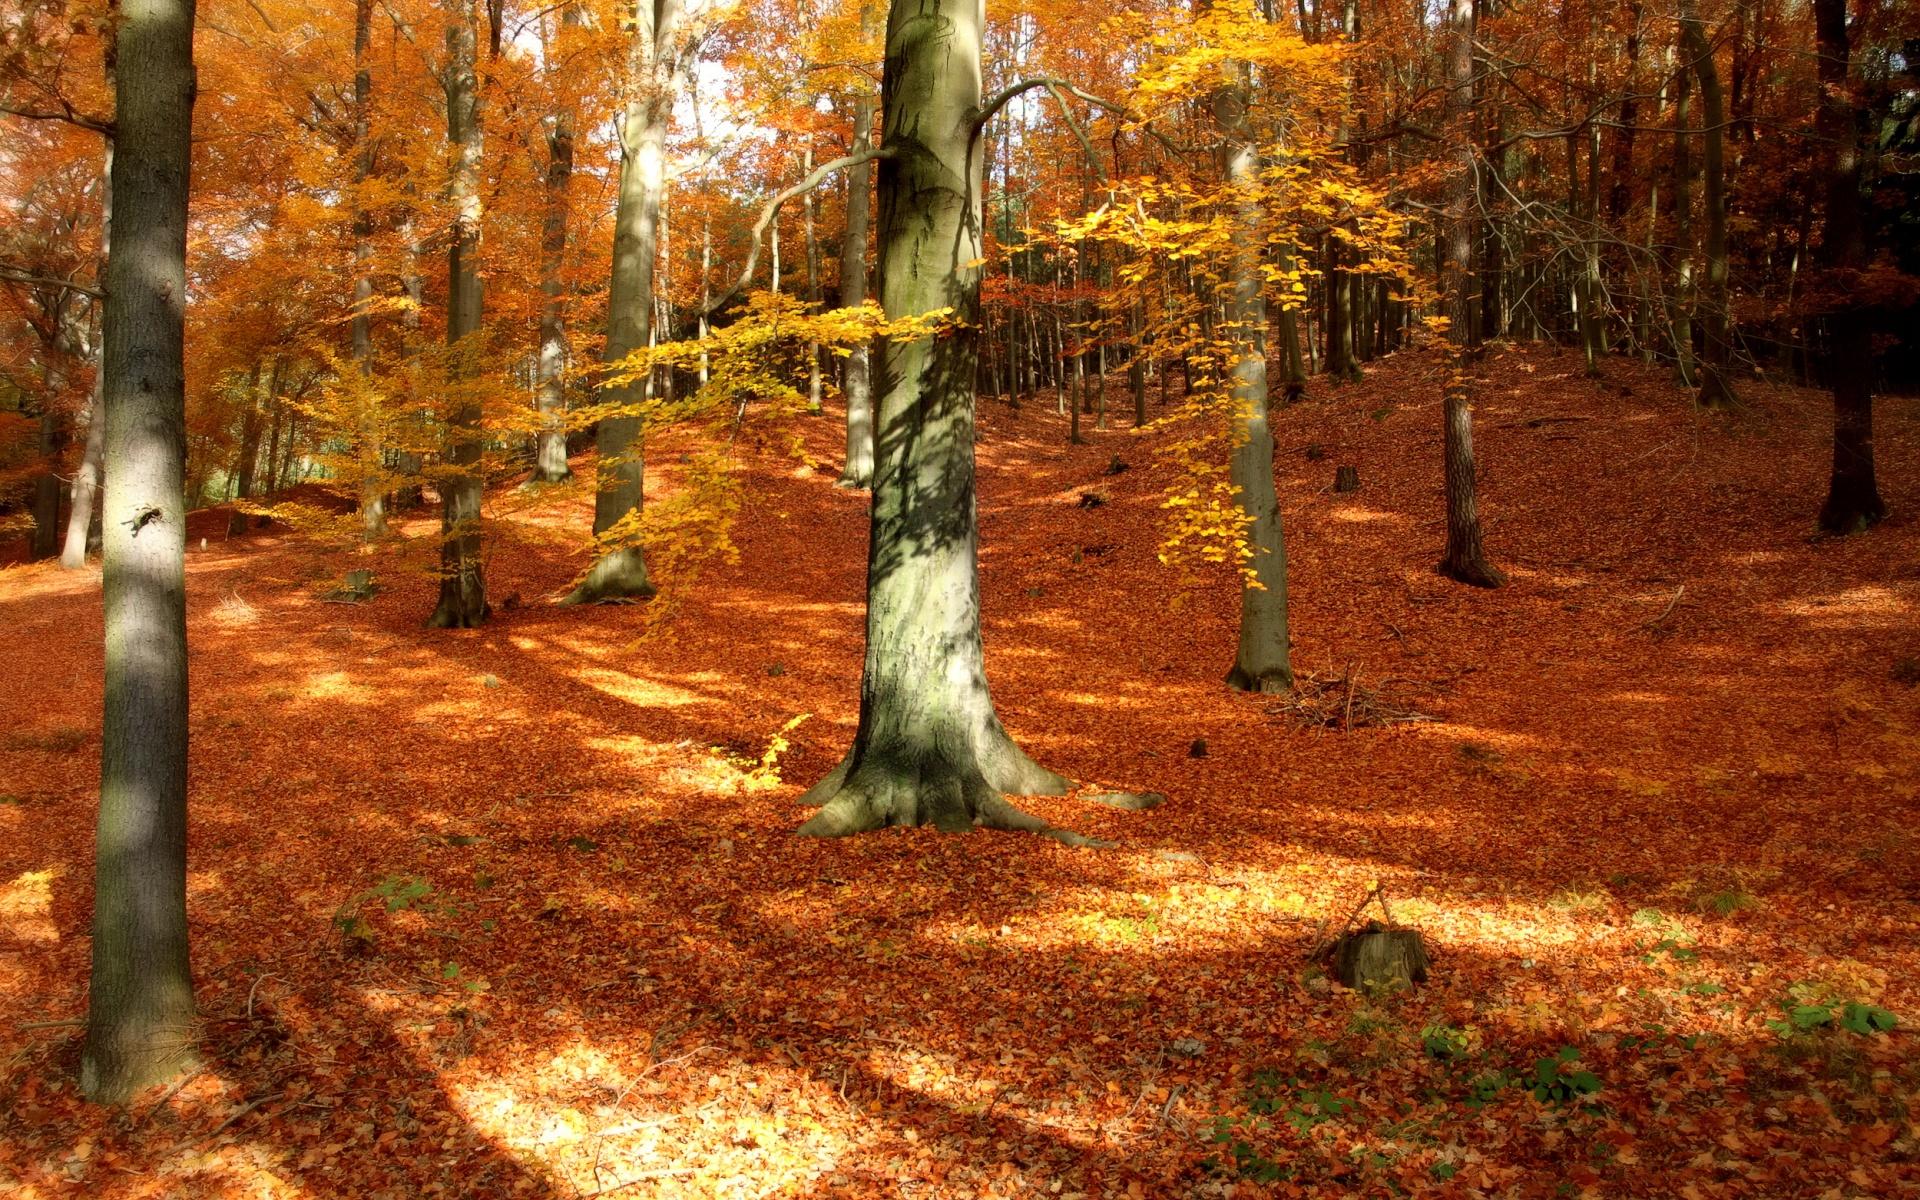 Free Wallpapers Fall Season Autumn Forest Wallpaper For Desktop Pixelstalk Net